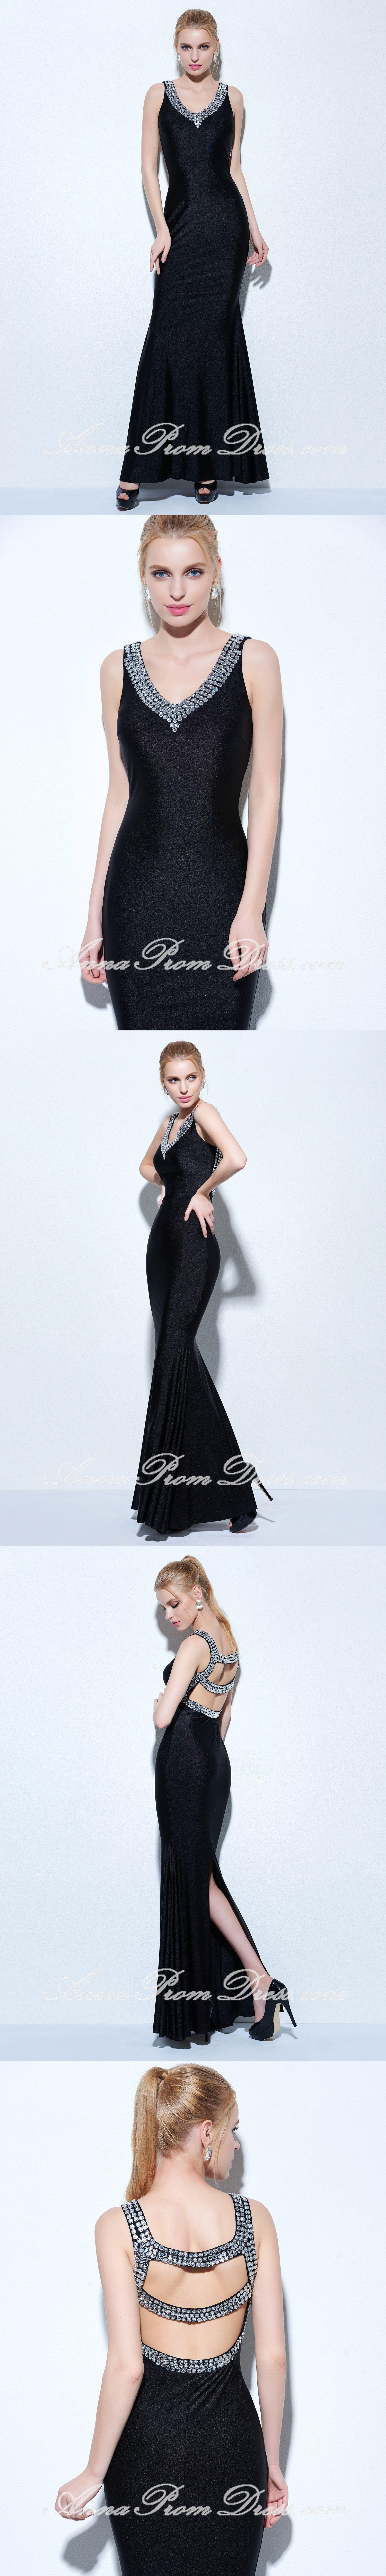 Black prom dresses v neck floorlength rhinestone sexy mermaid prom